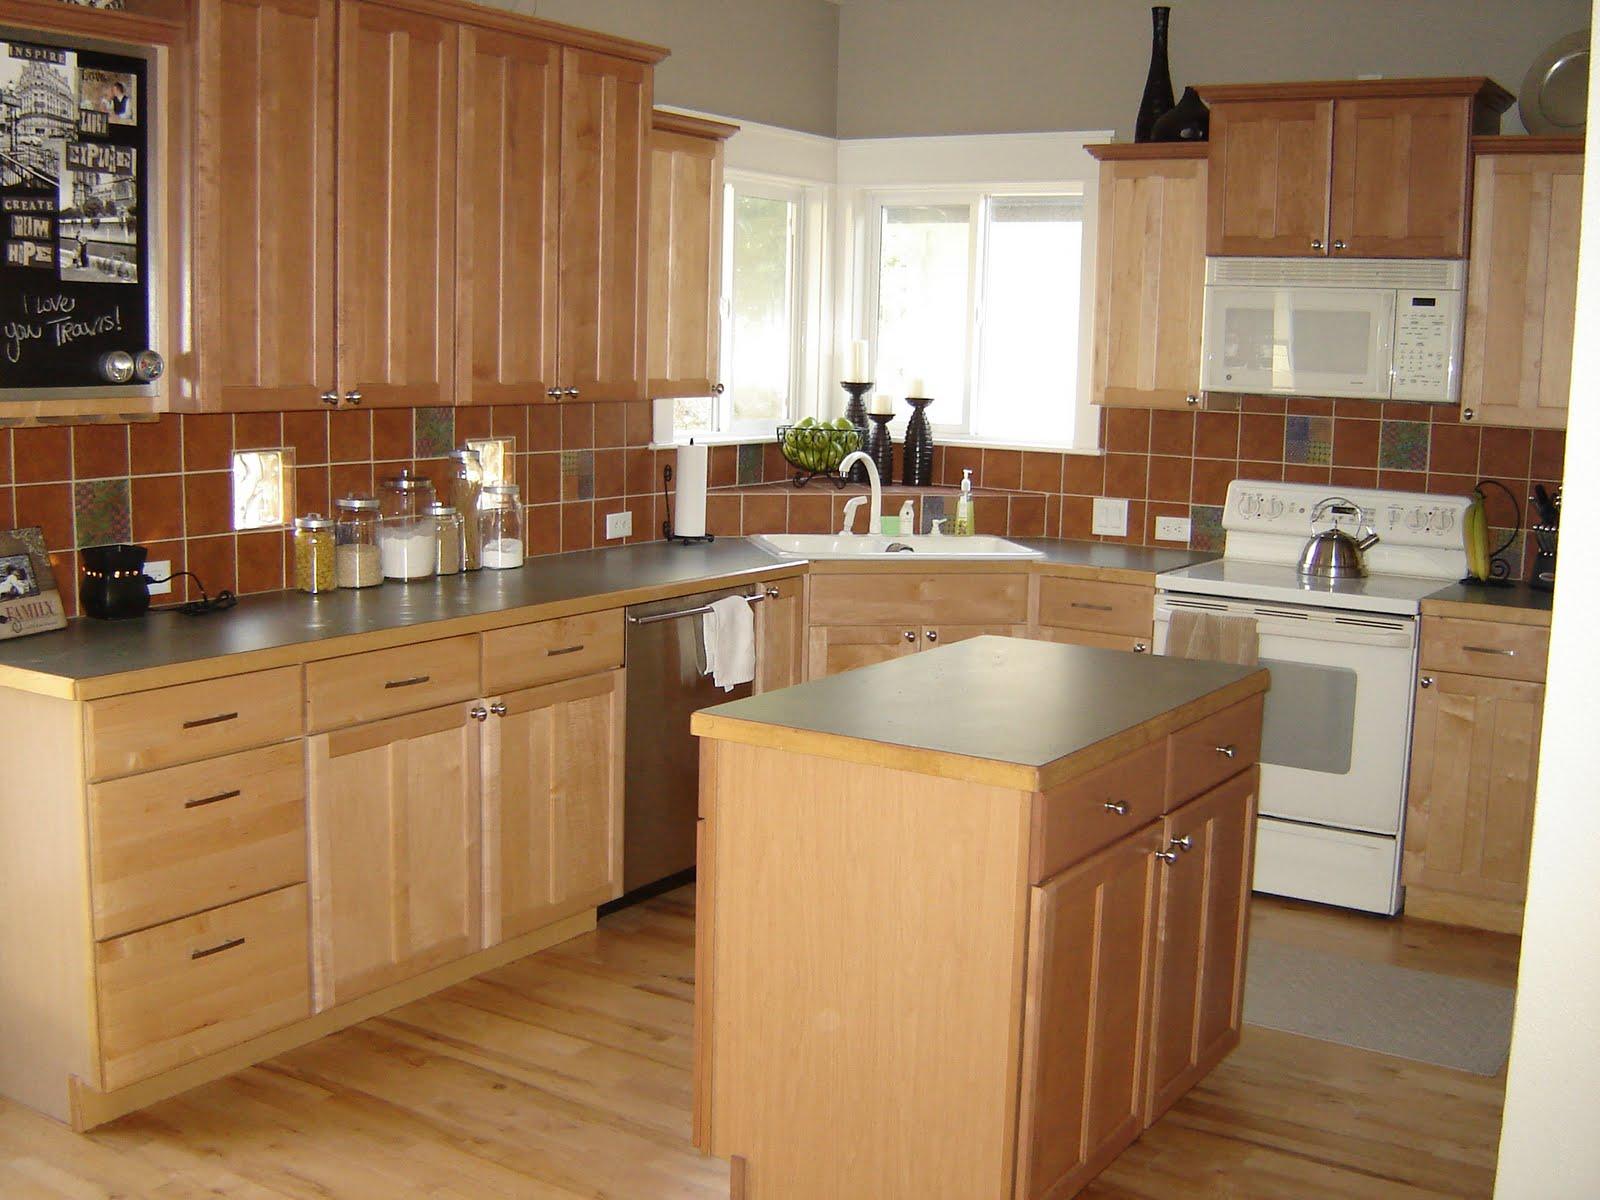 My suite bliss diy kitchen island re do - Inexpensive kitchen island ideas ...